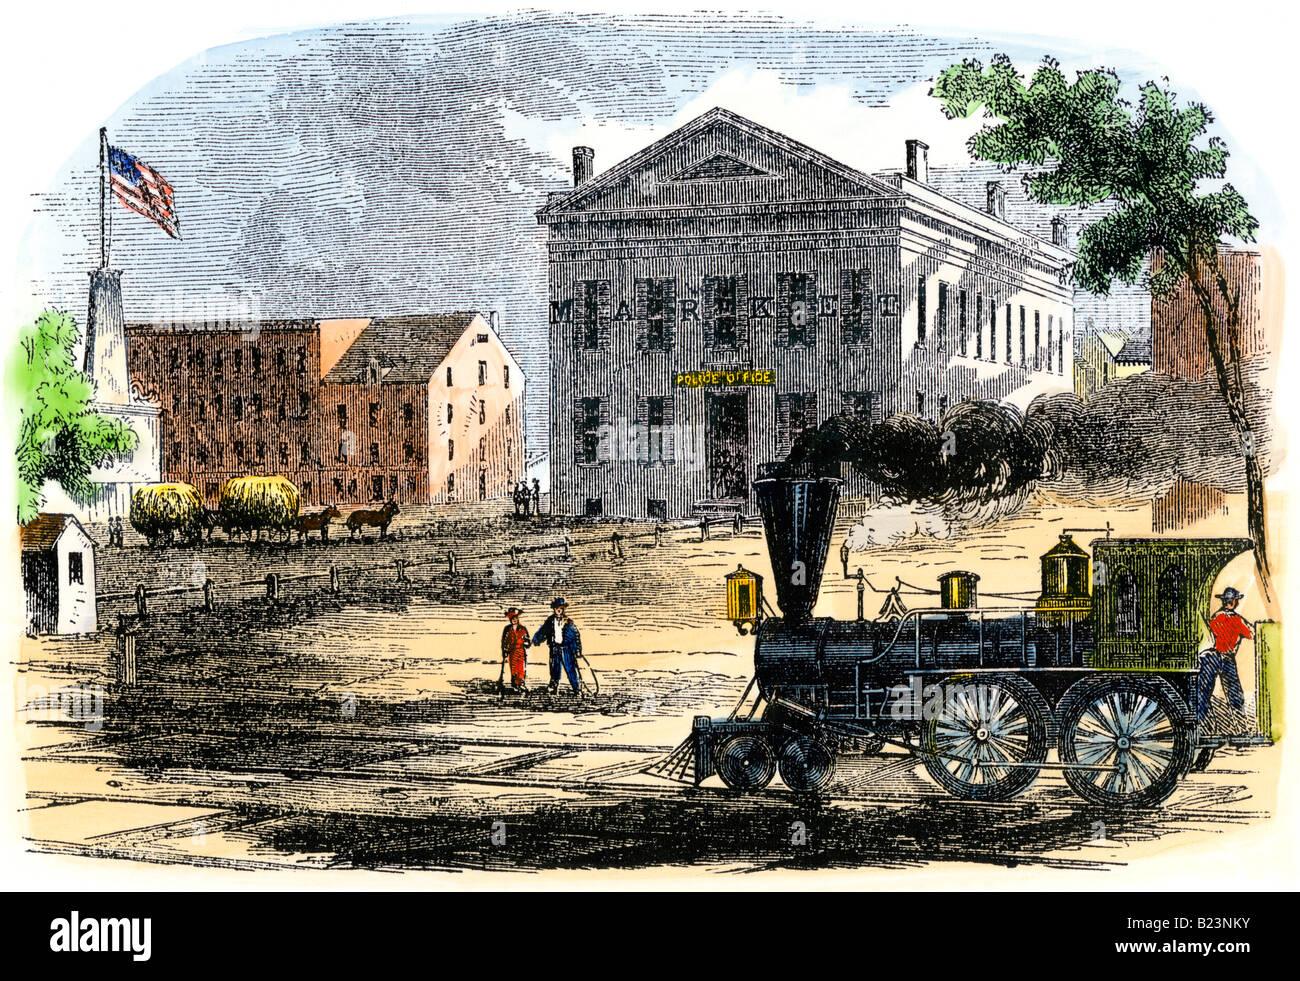 Steam locomotive in Syracuse New York 1850s - Stock Image